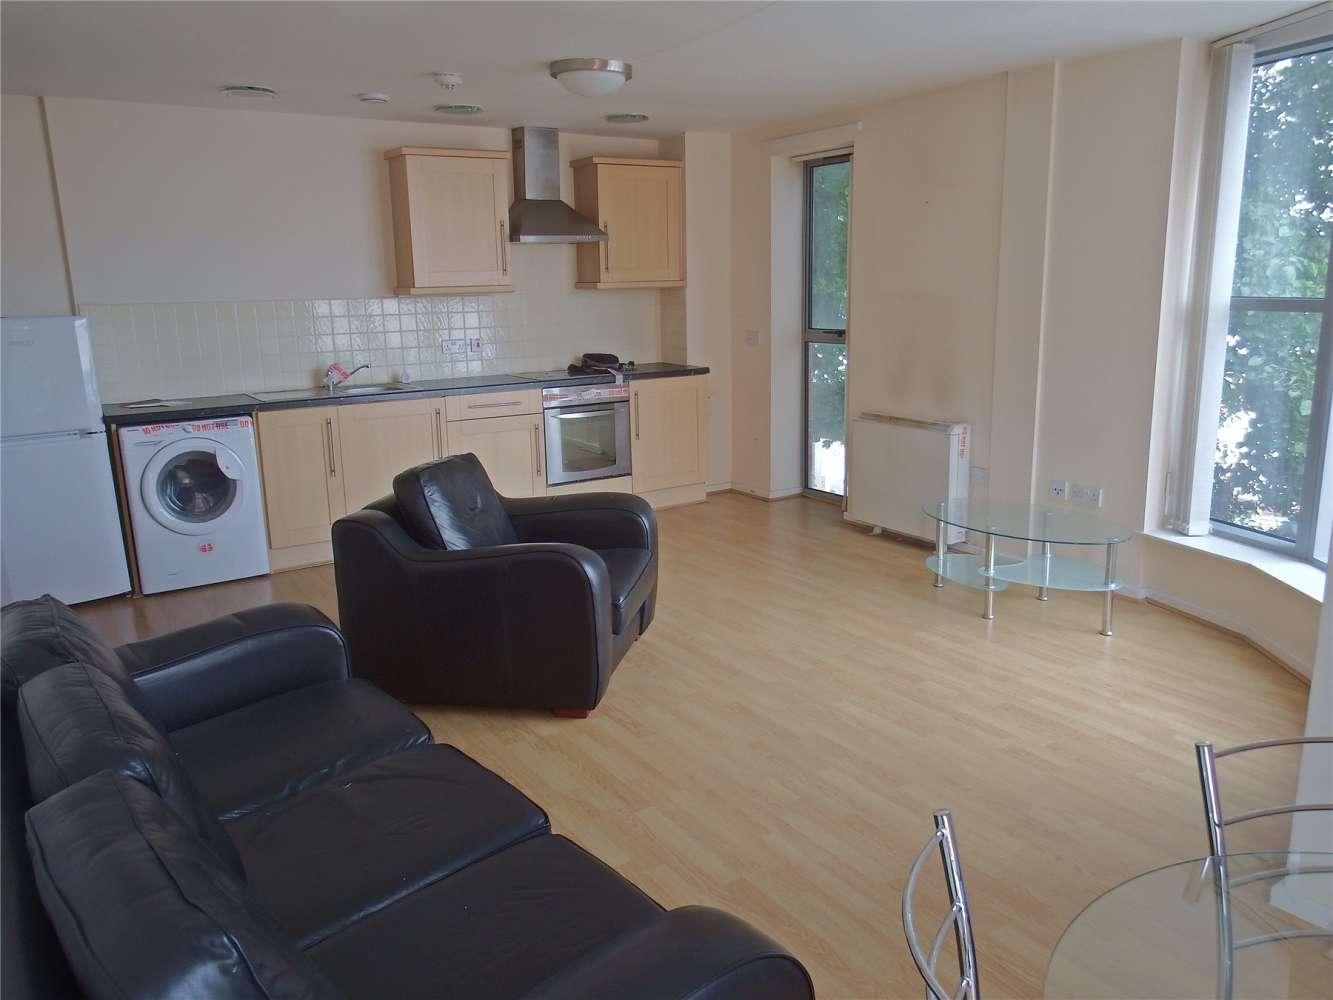 Apartment Leeds, LS2 - Ahlux Court Millwright Street Leeds West Yorkshire - 01